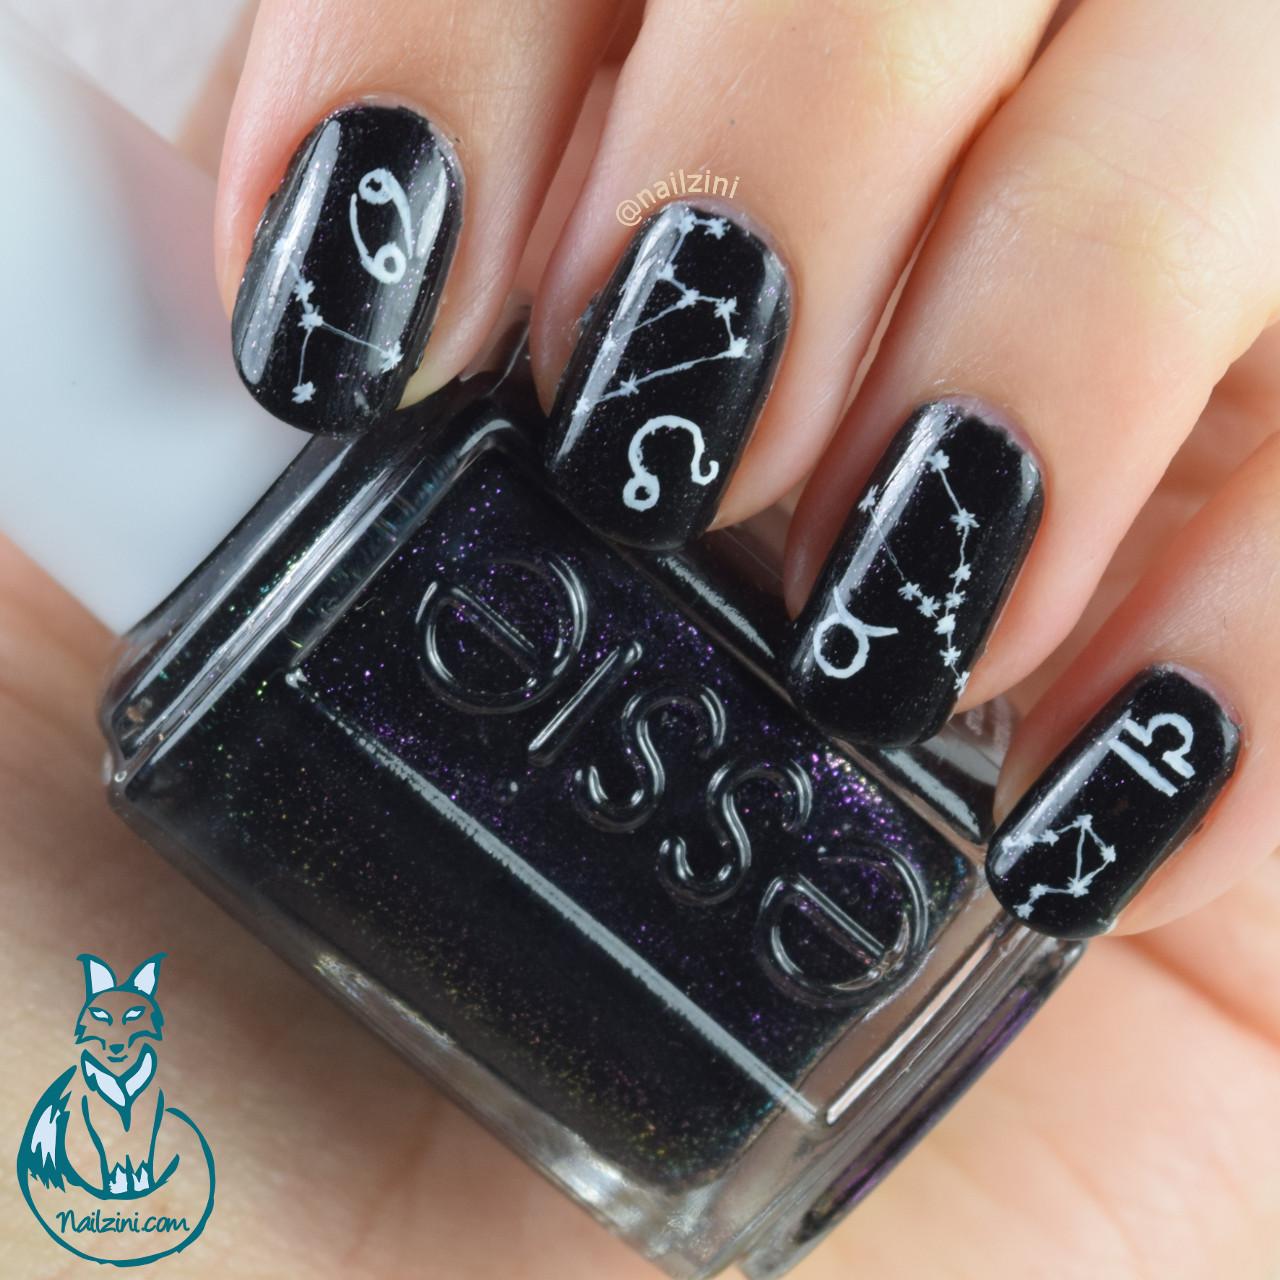 Nailzini A Nail Art Blog: Nailzini: A Nail Art Blog